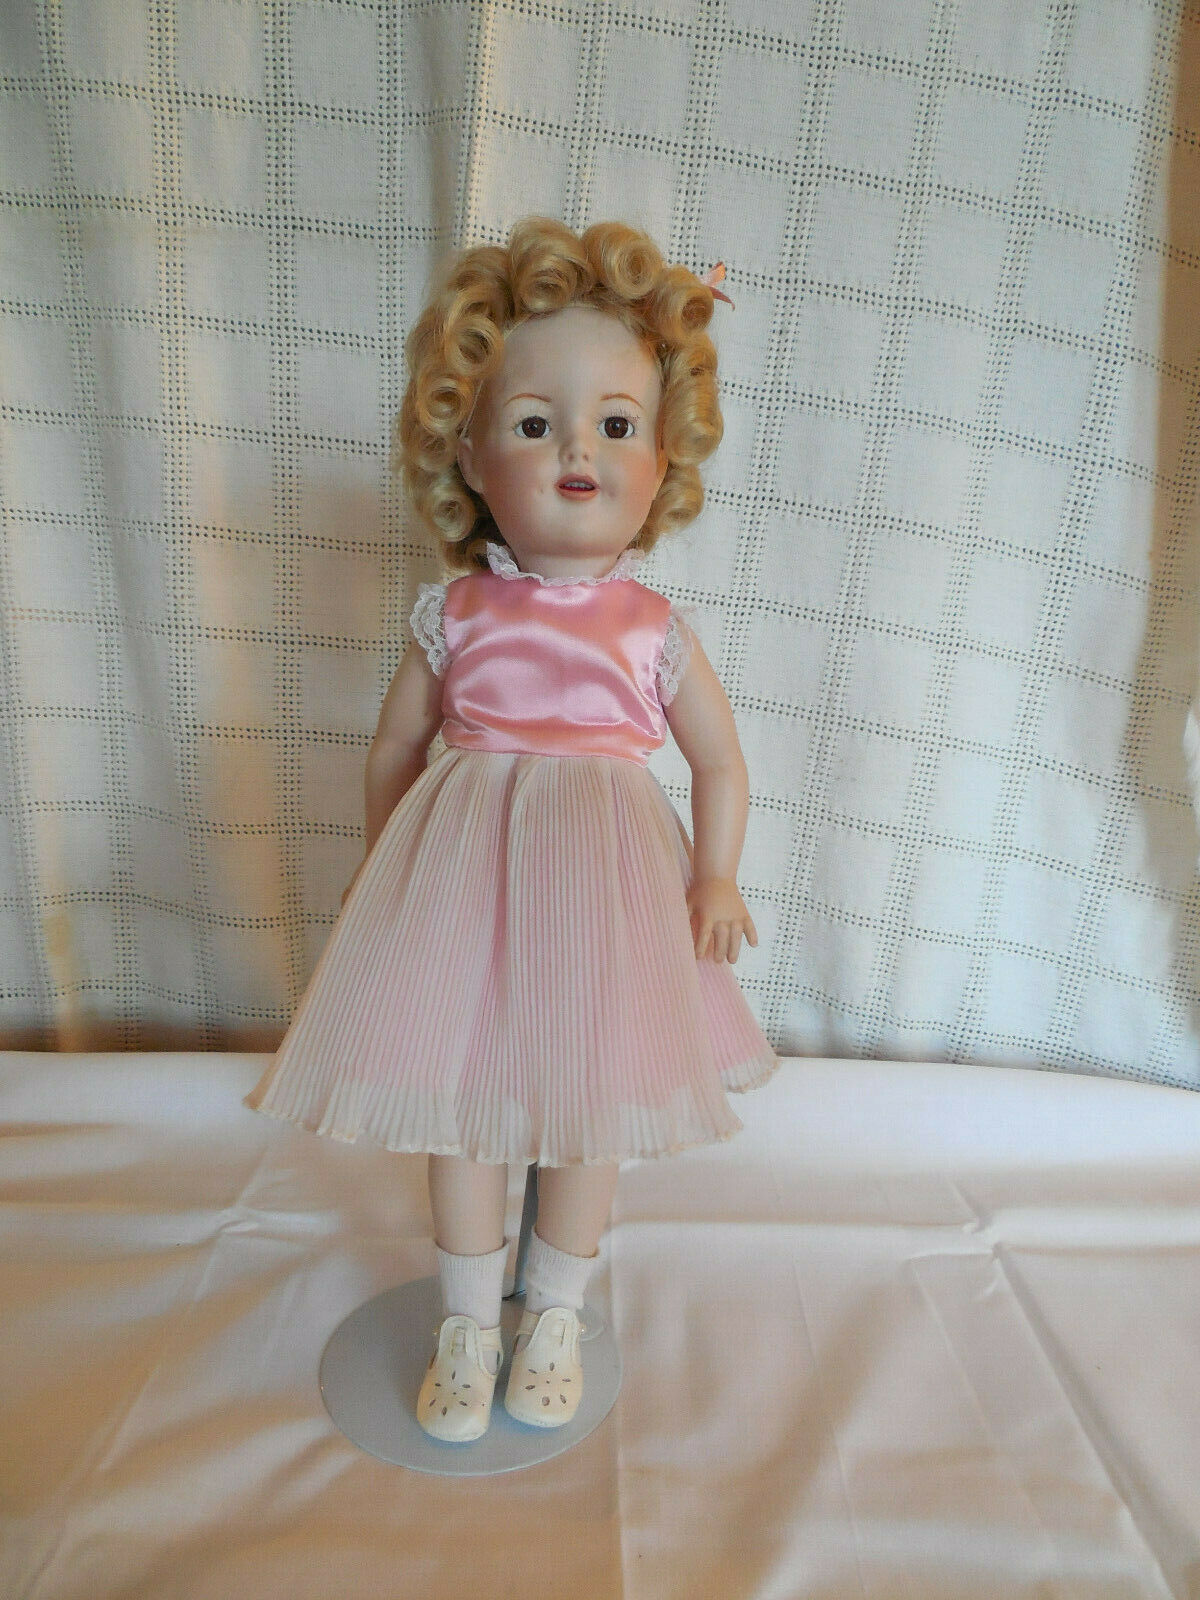 Porcelana muñeca de Shirley Temple Completo Hecho a Mano 16  firmado J Boyer 1995